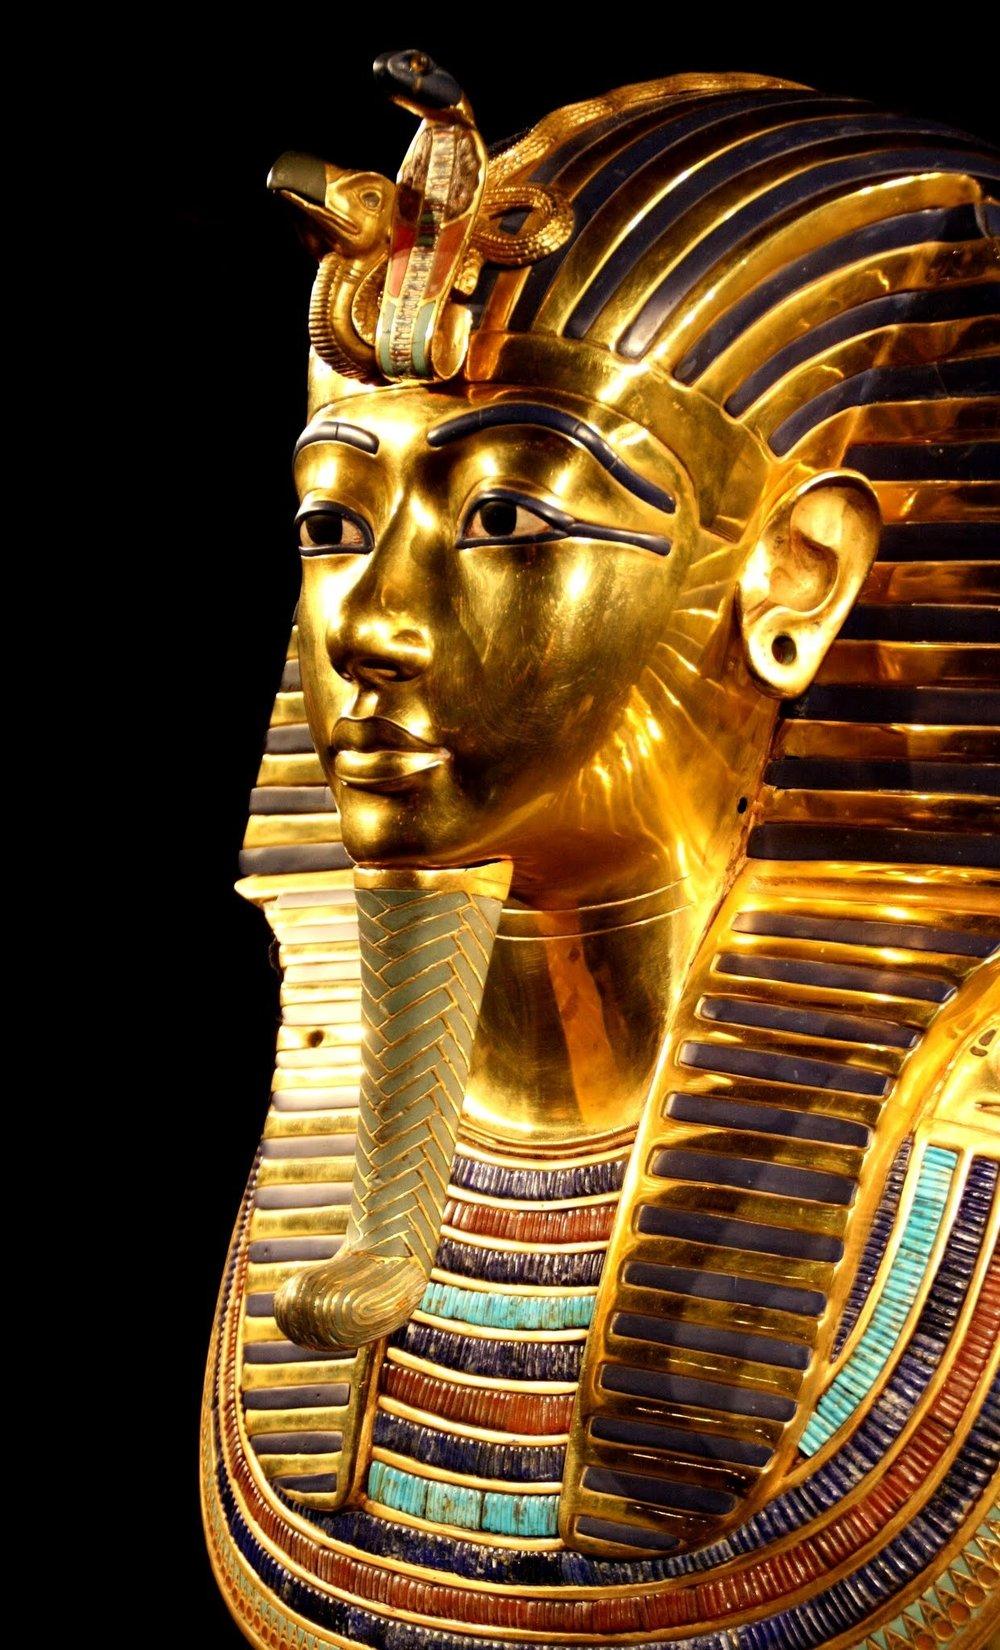 ancient-death-mask-egypt-33571.jpg